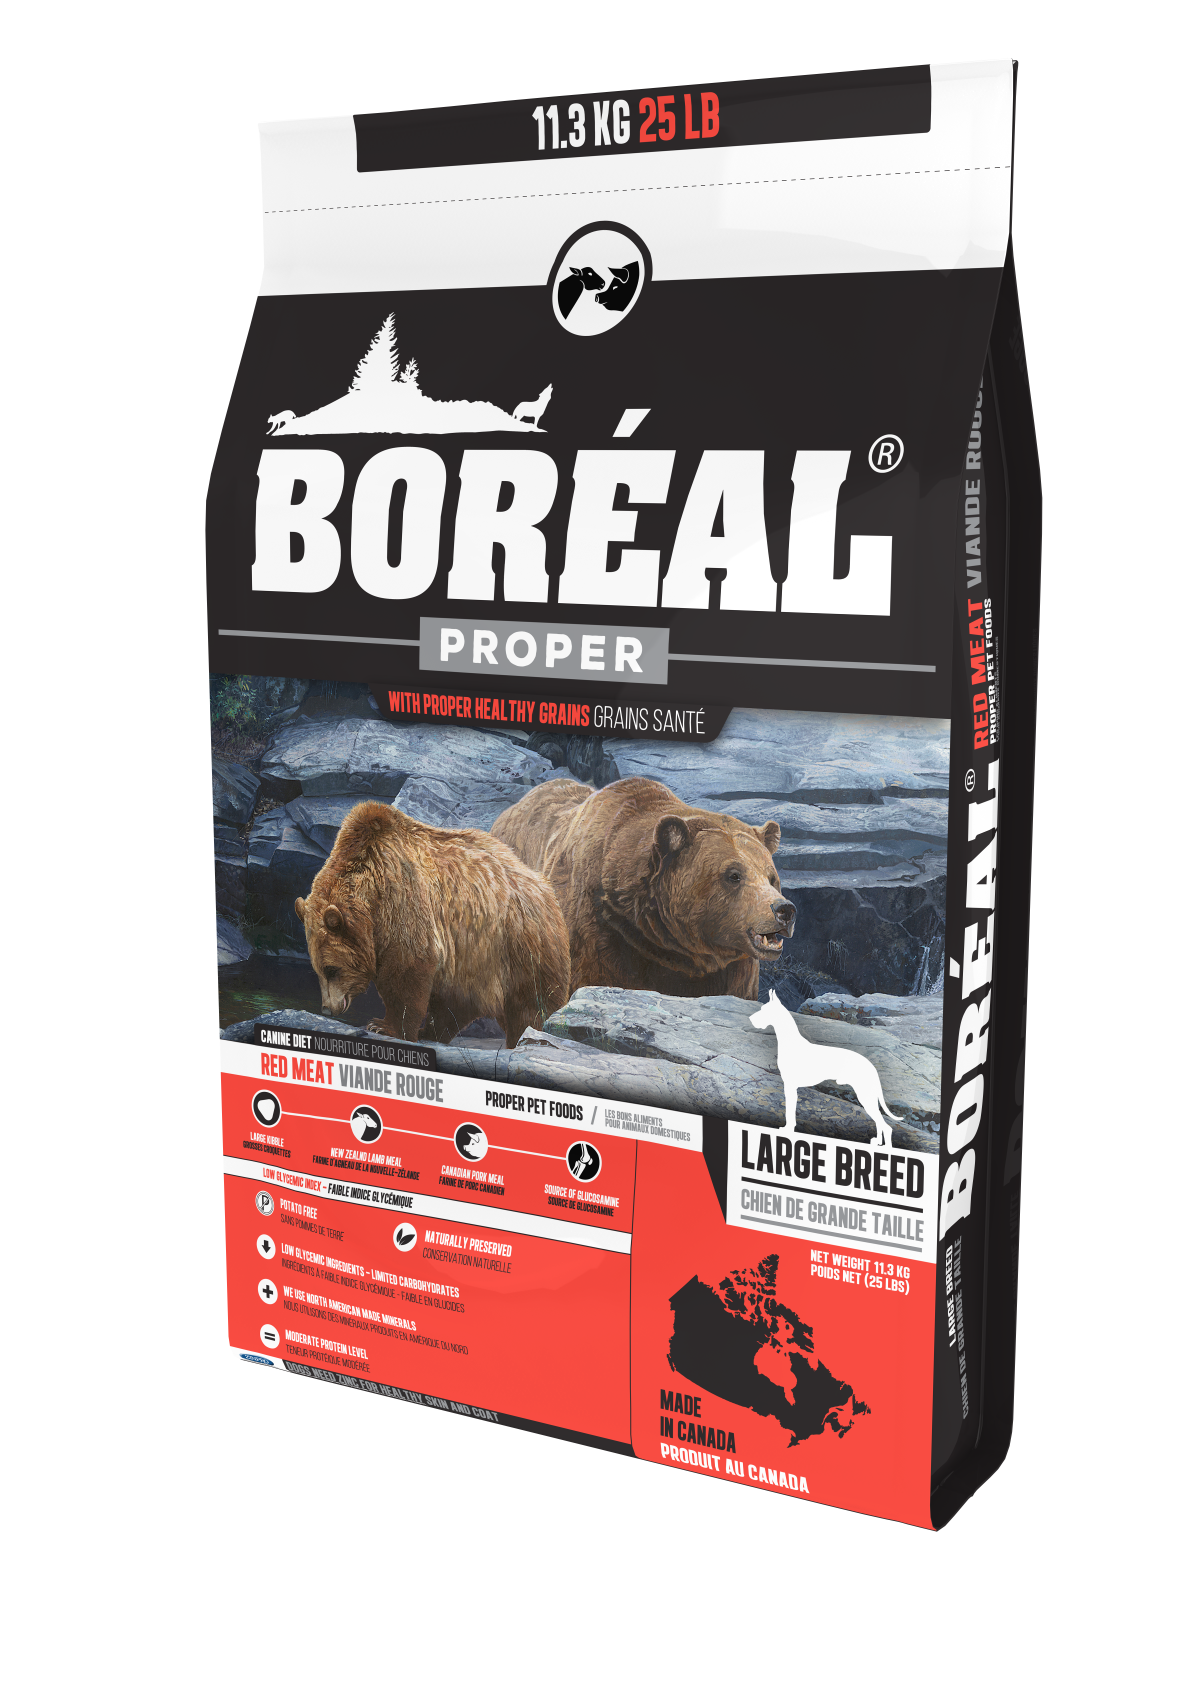 Boreal Proper Large Breed Red Meat - Low Carb Grains Dry Dog Food, 11.33kg bag